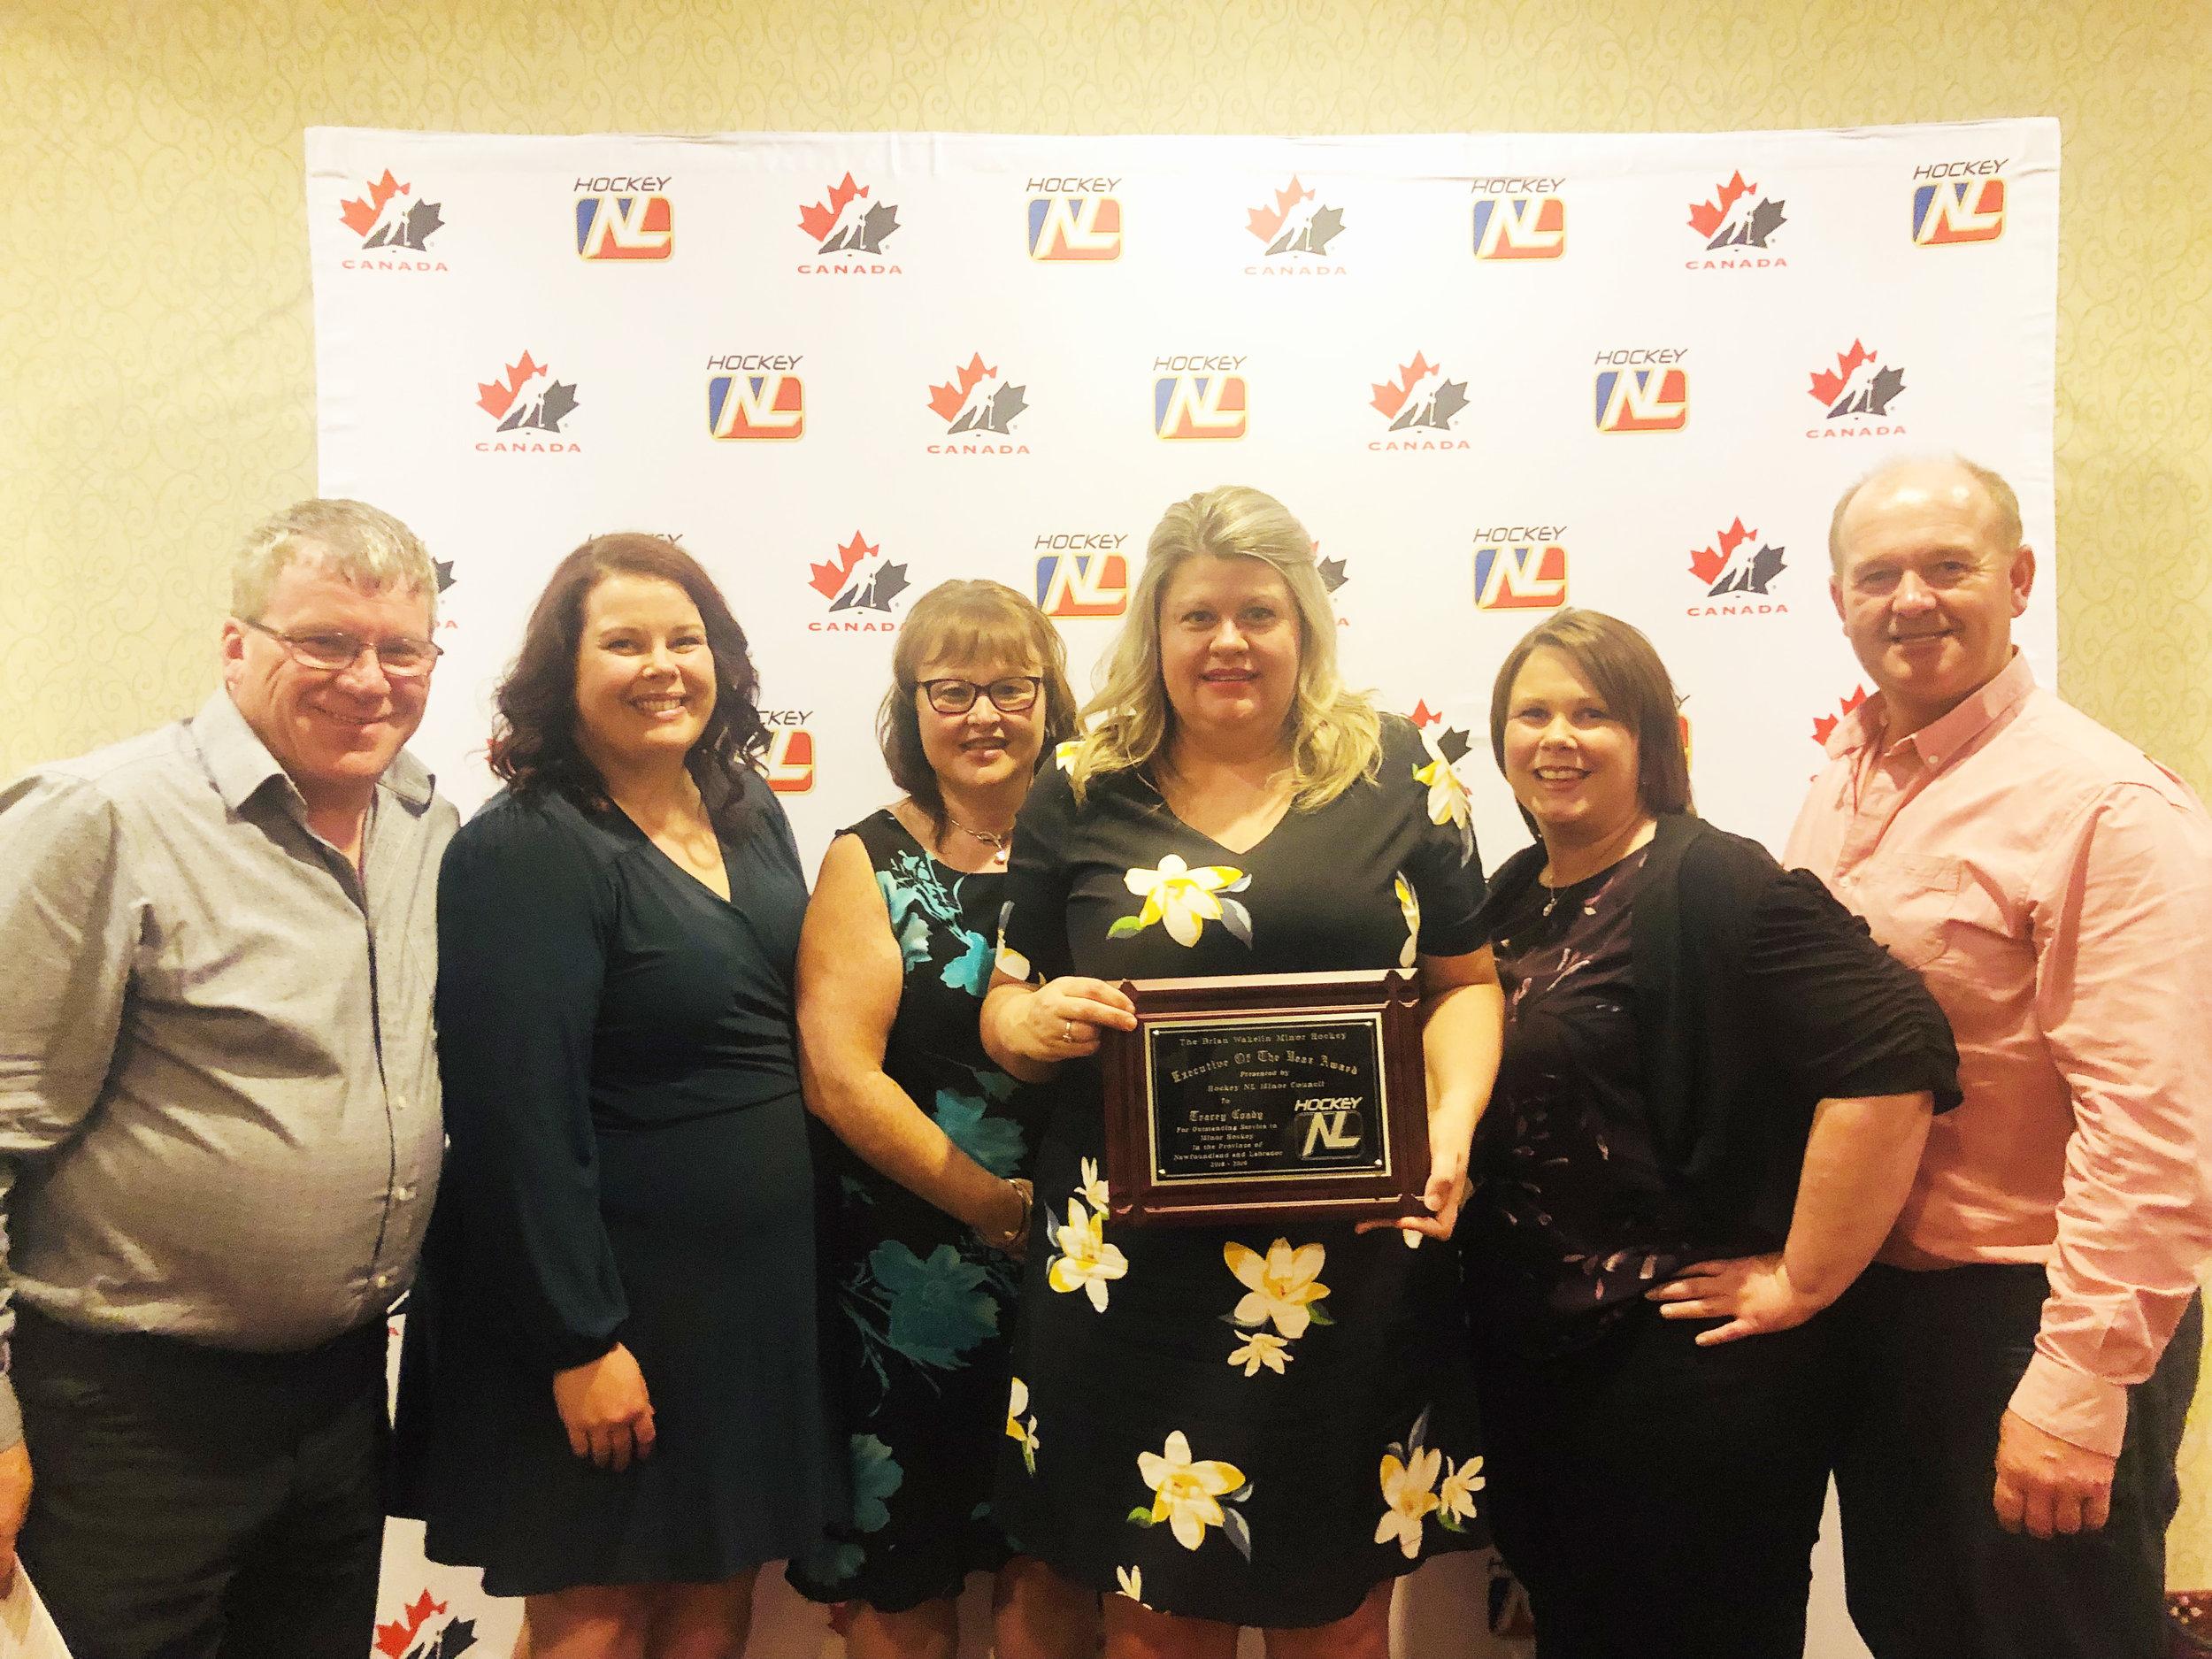 Members of the Southern Shore Minor Hockey Association congratulate Tracy Coady on winning one of Hoockey NL's top honours. From left are Luke Bidgood, Susan Mullowney, Amanda Duggan, Tracey Coady, Melissa Lynch, and Rodney Sullivan.